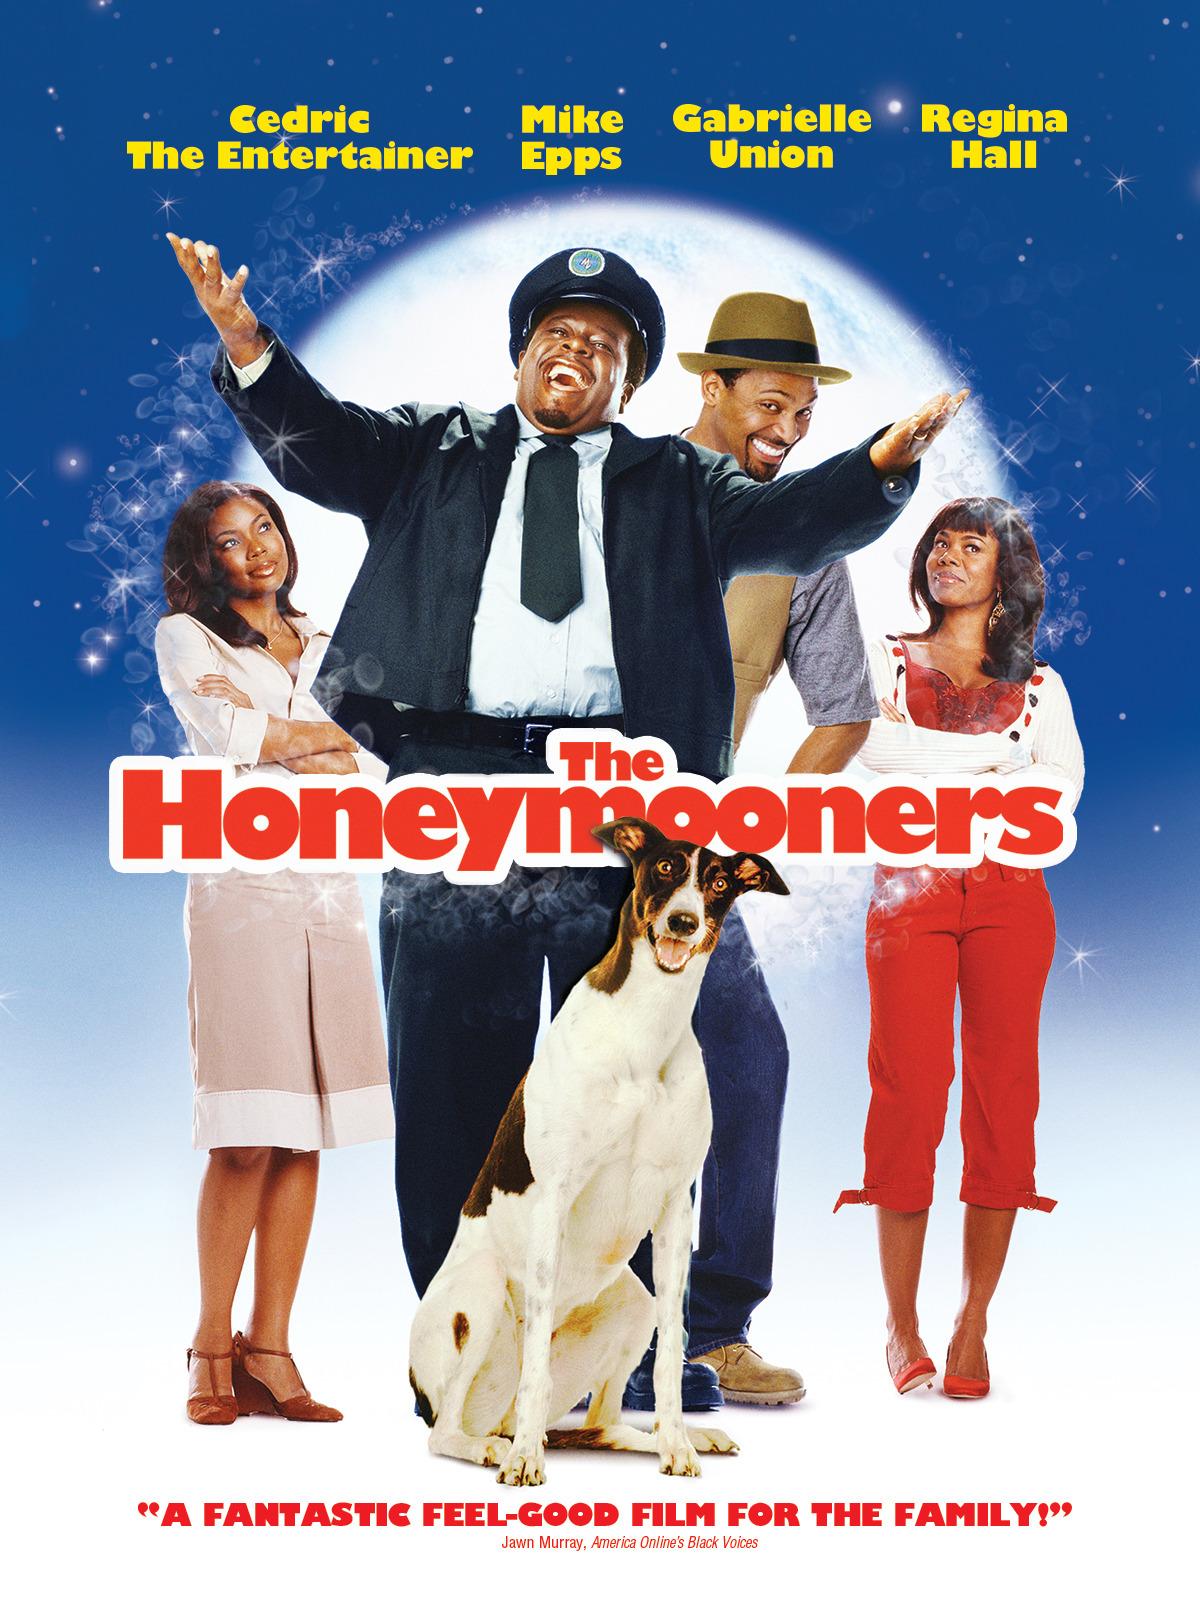 The Honeymooners (2005) Hindi Dubbed